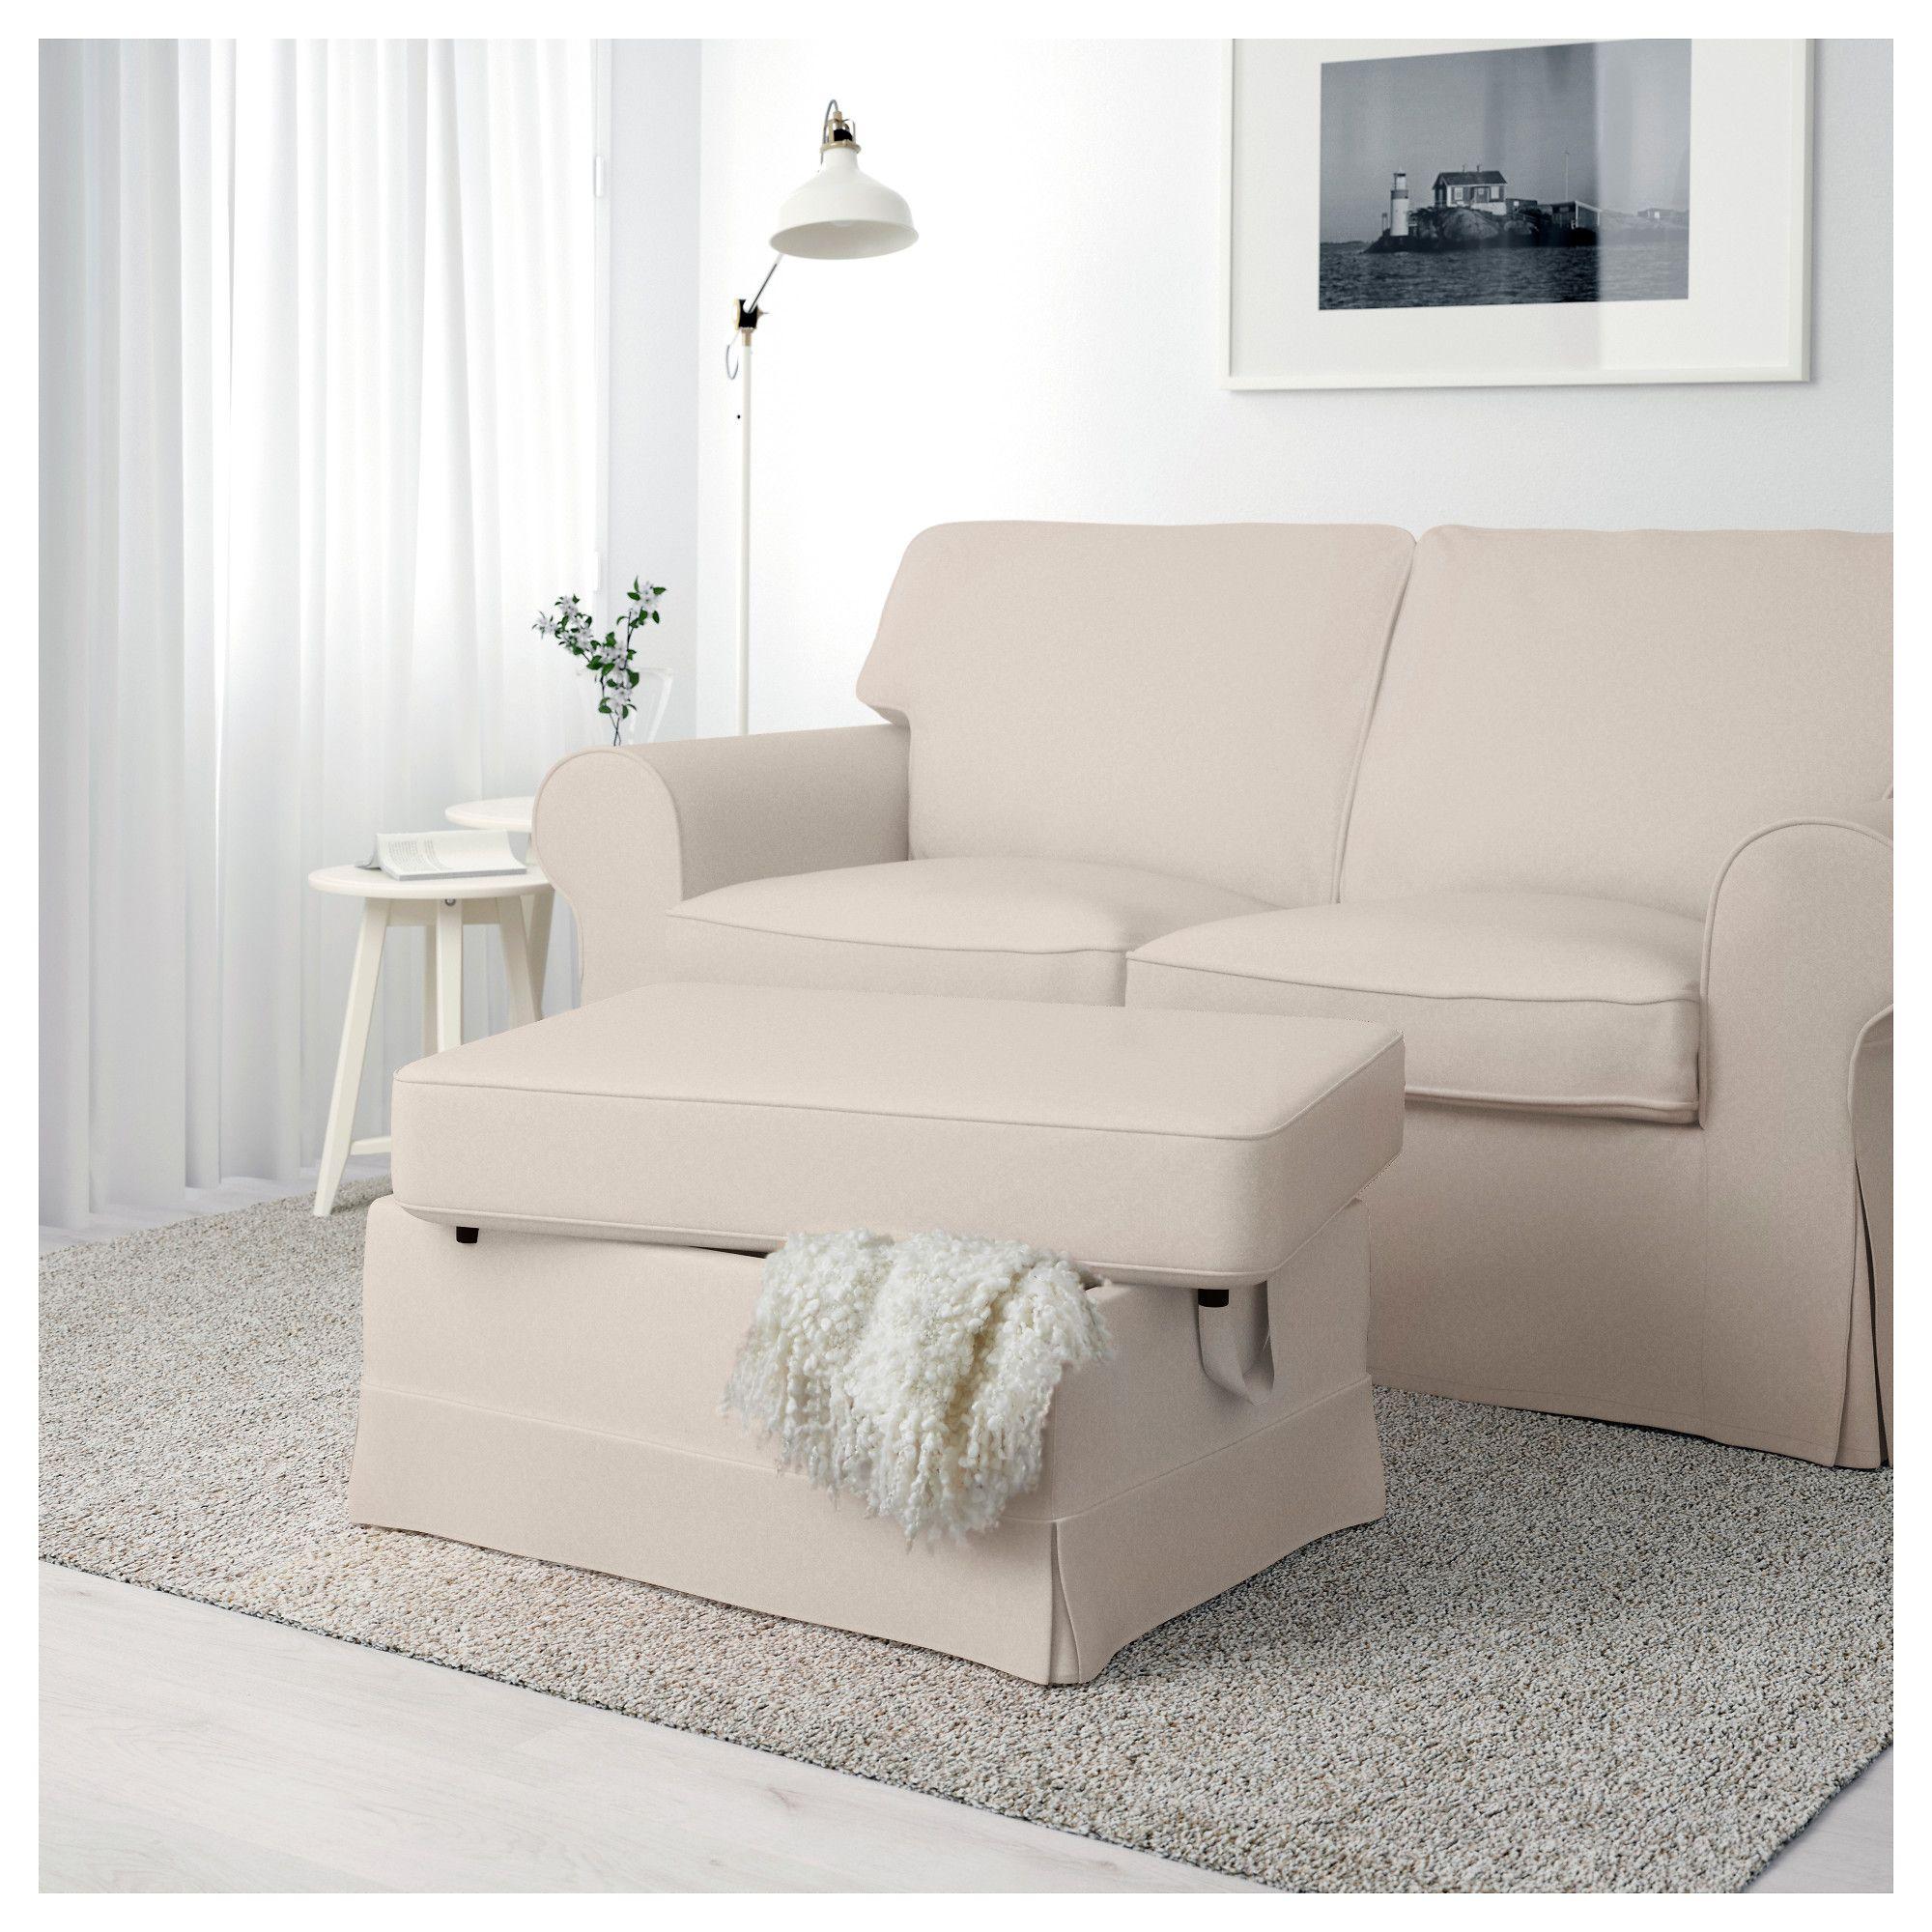 Furniture And Home Furnishings Ikea Footstool Ikea